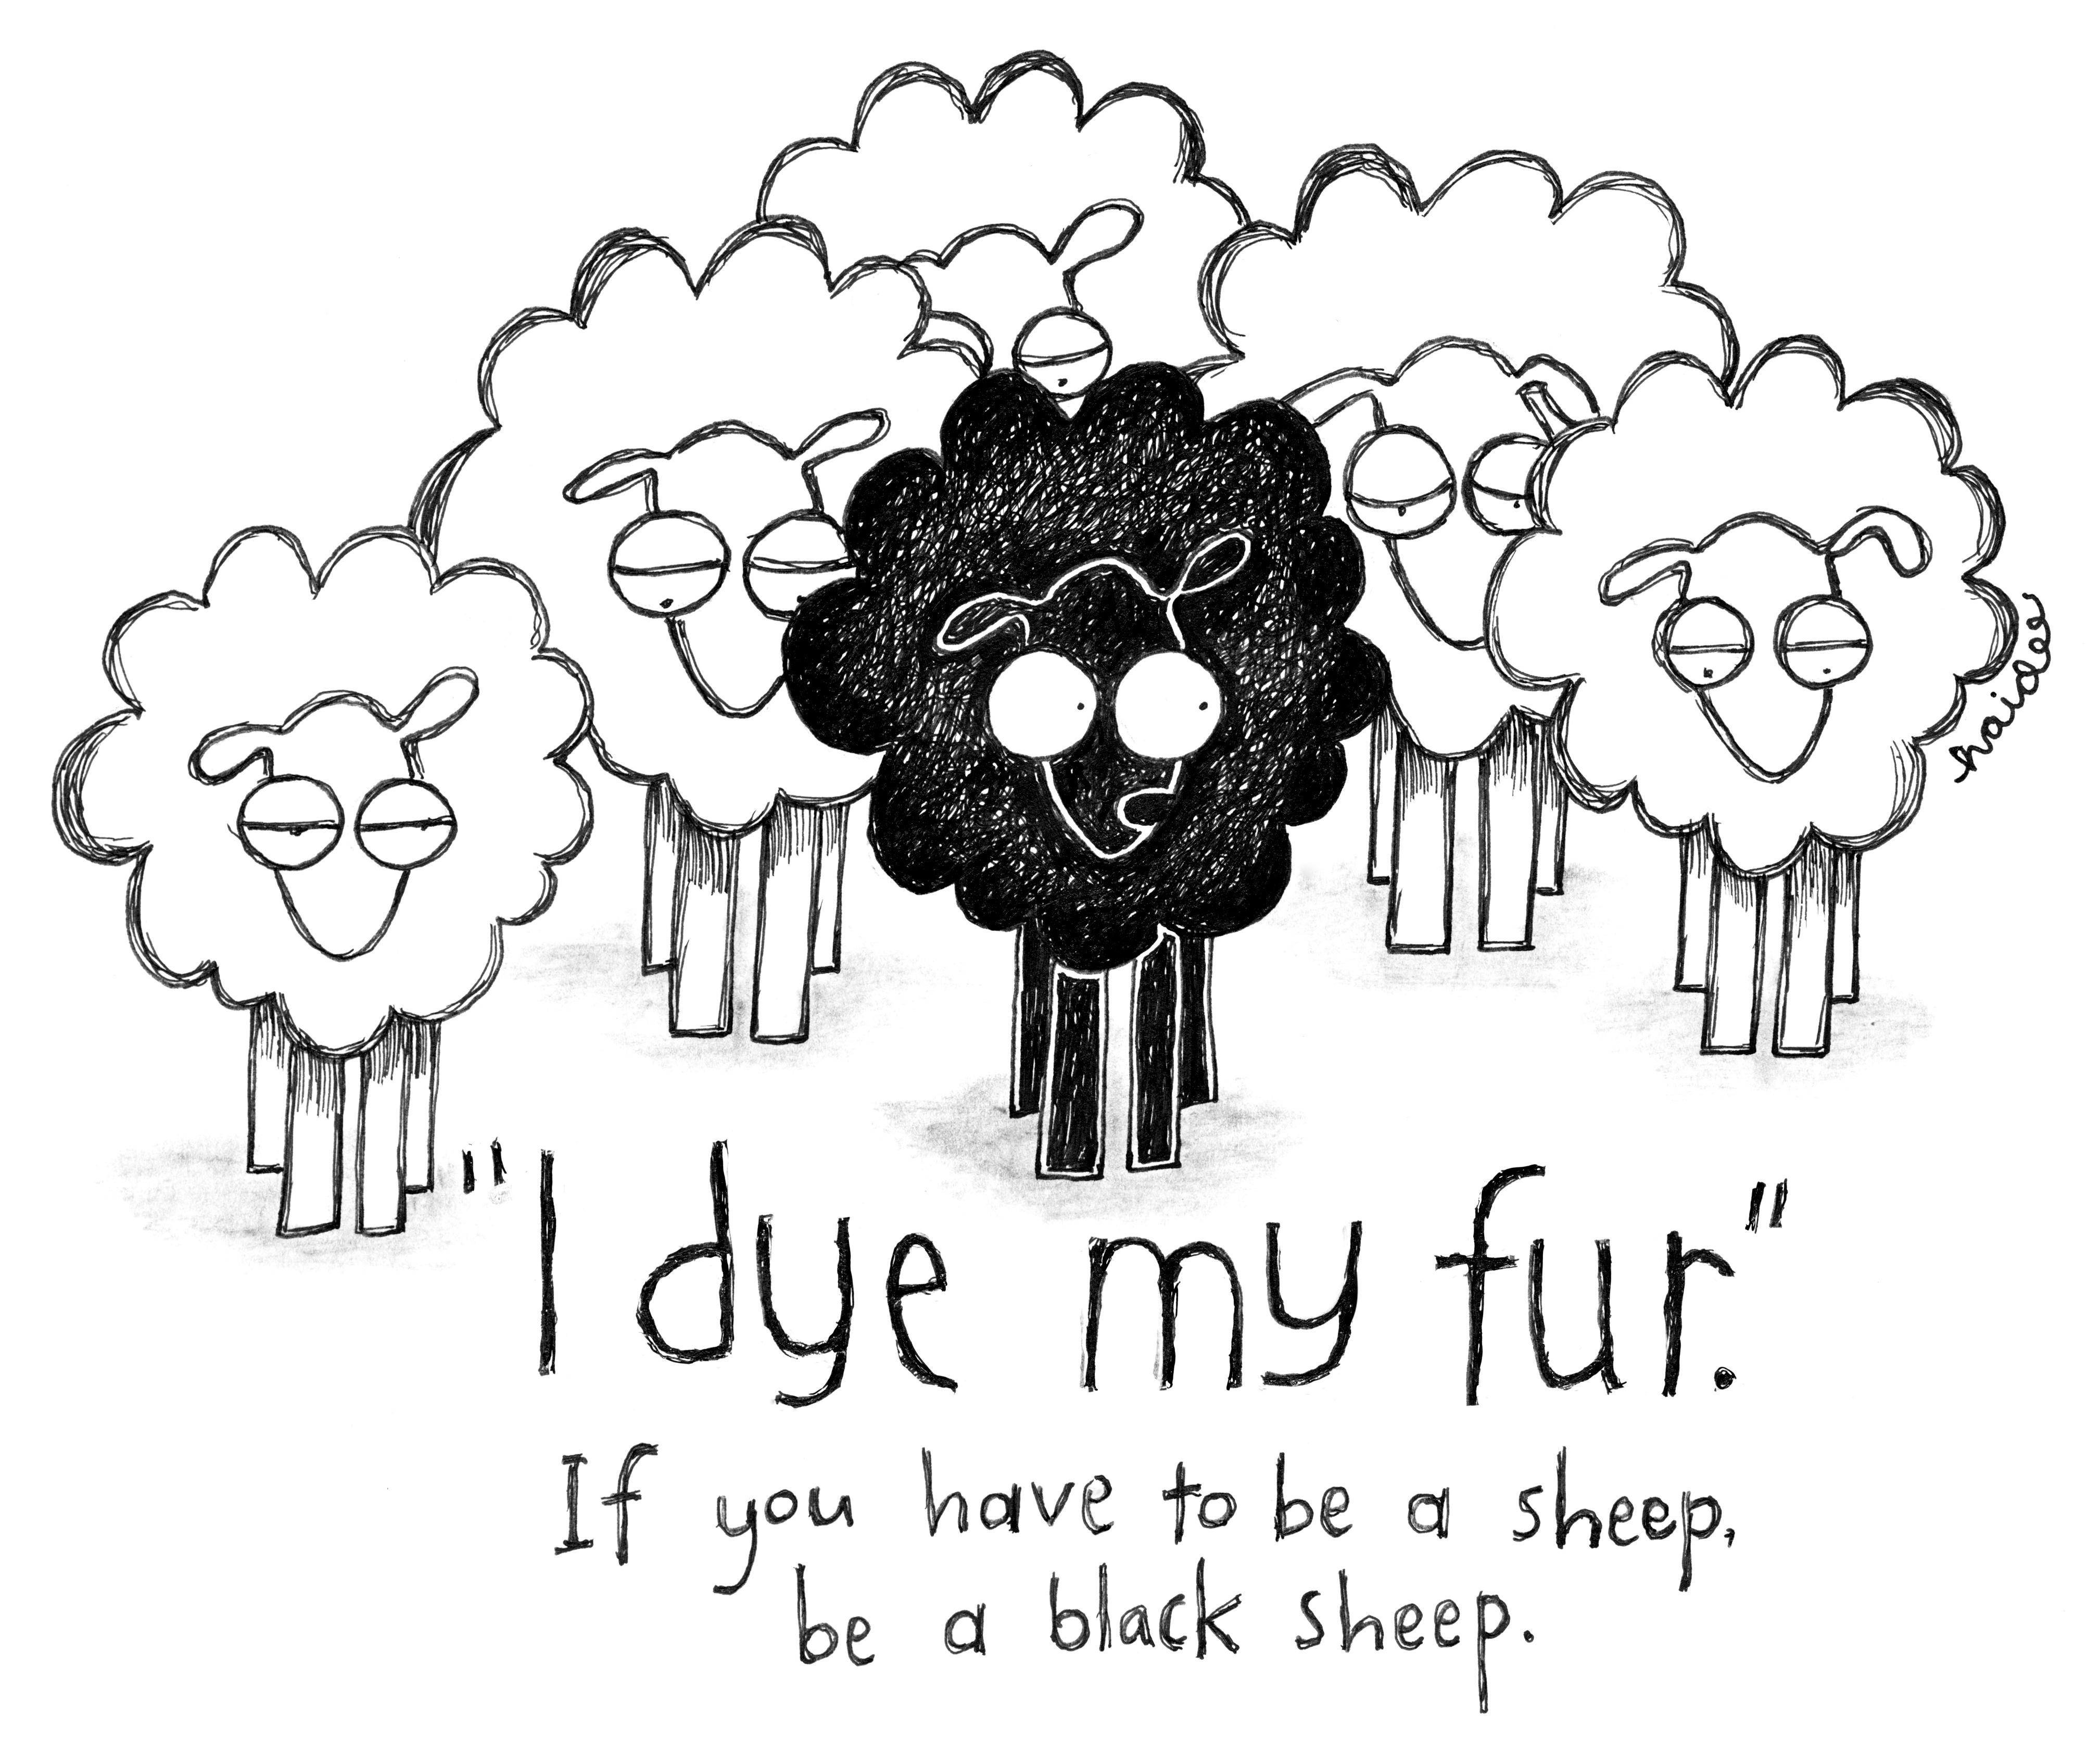 the black sheep Black sheep 秋田市手形字蛇野172-3 ルピナス手形101 tel018-874-8890 営業時間/11:00~20:00 お問い合わせはこちら.